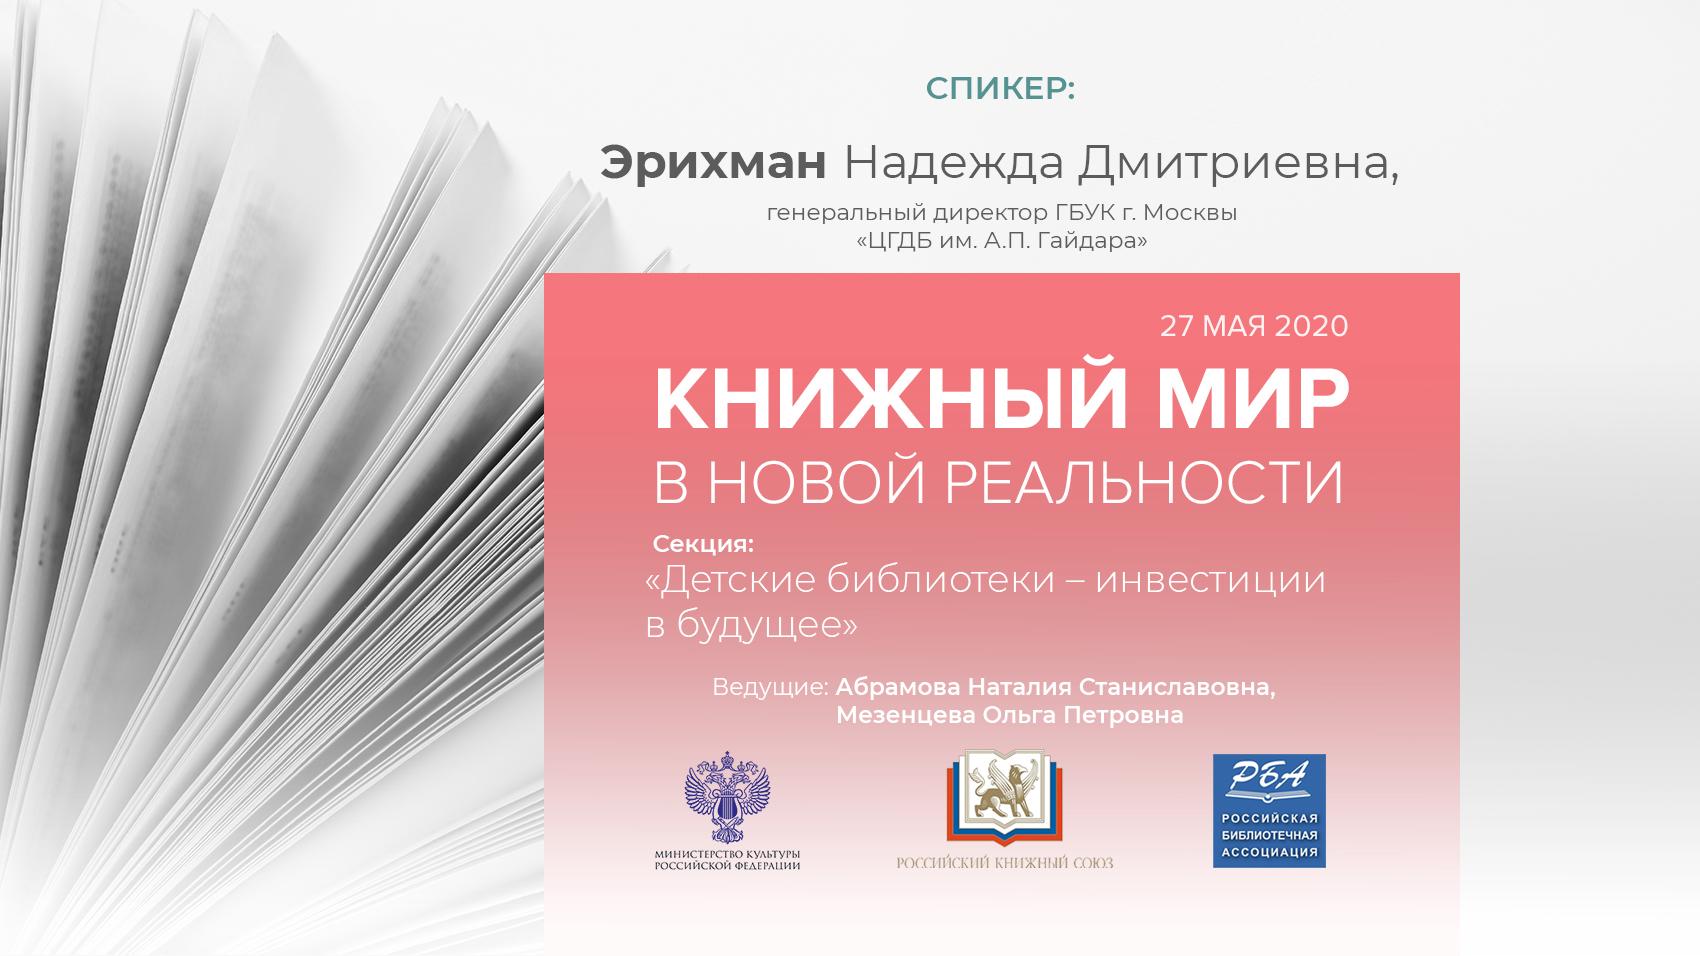 Эрихман Надежда Дмитриевна